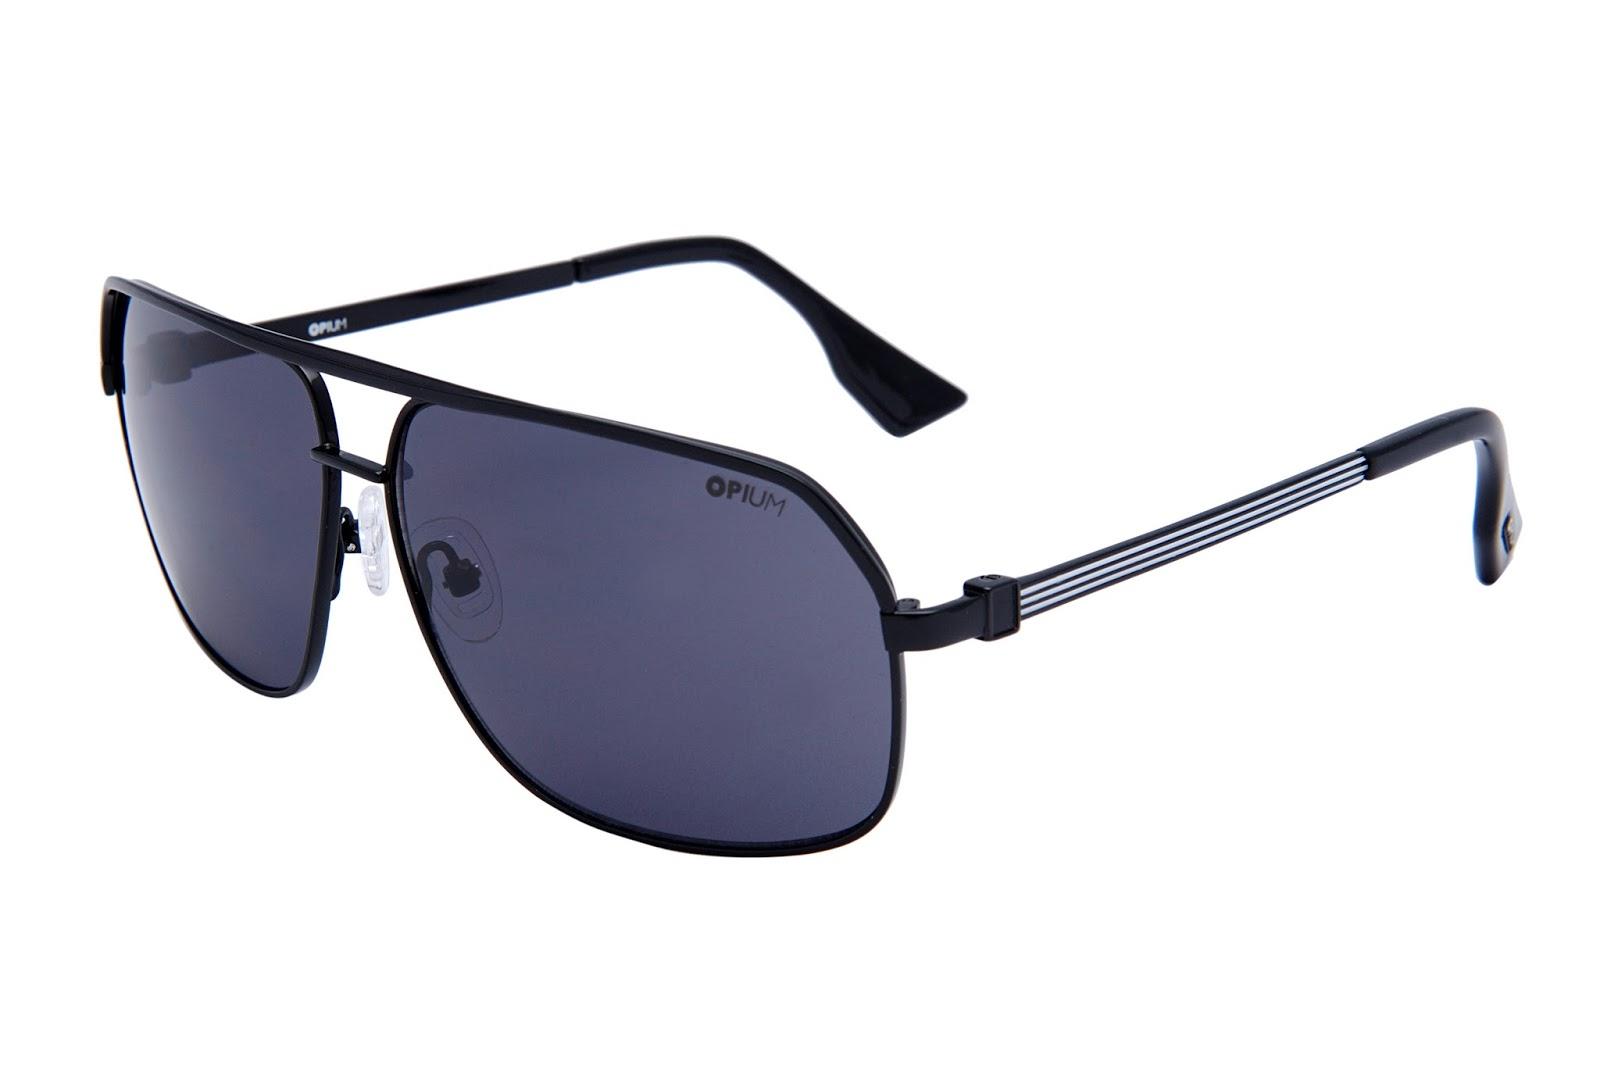 Online glasses shopping india